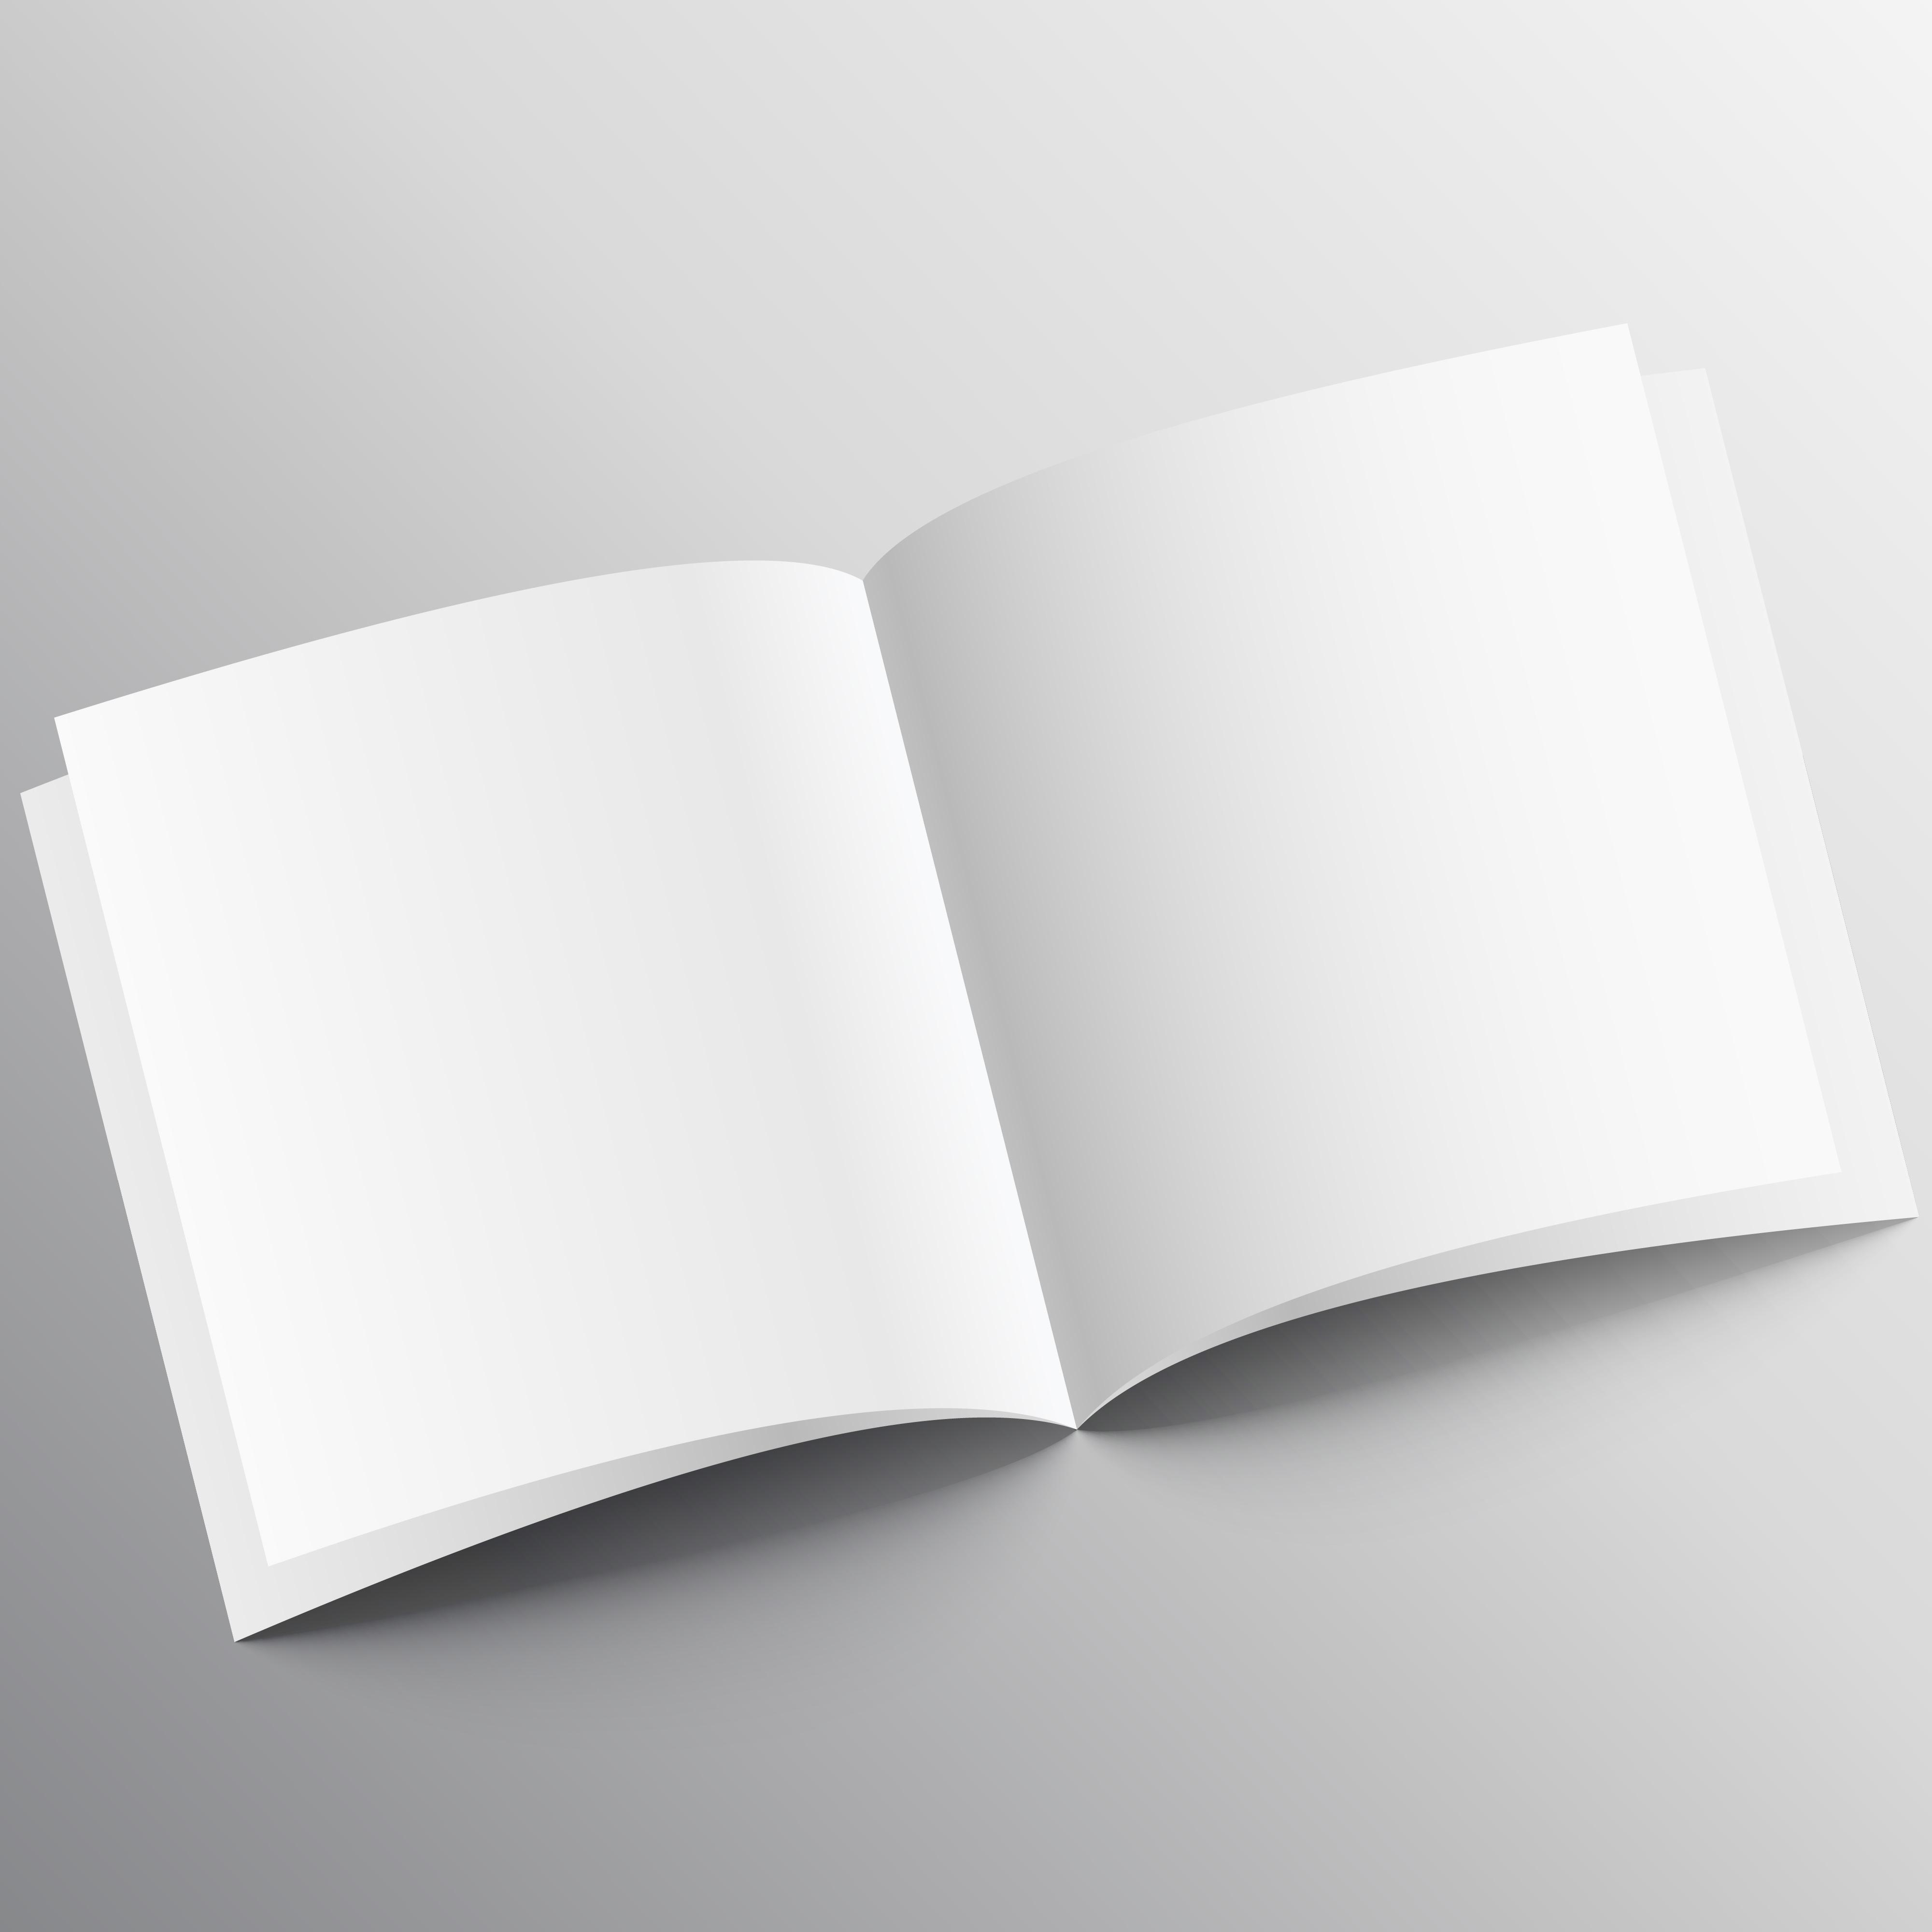 Open Magazine Free Vector Art 3101 Free Downloads